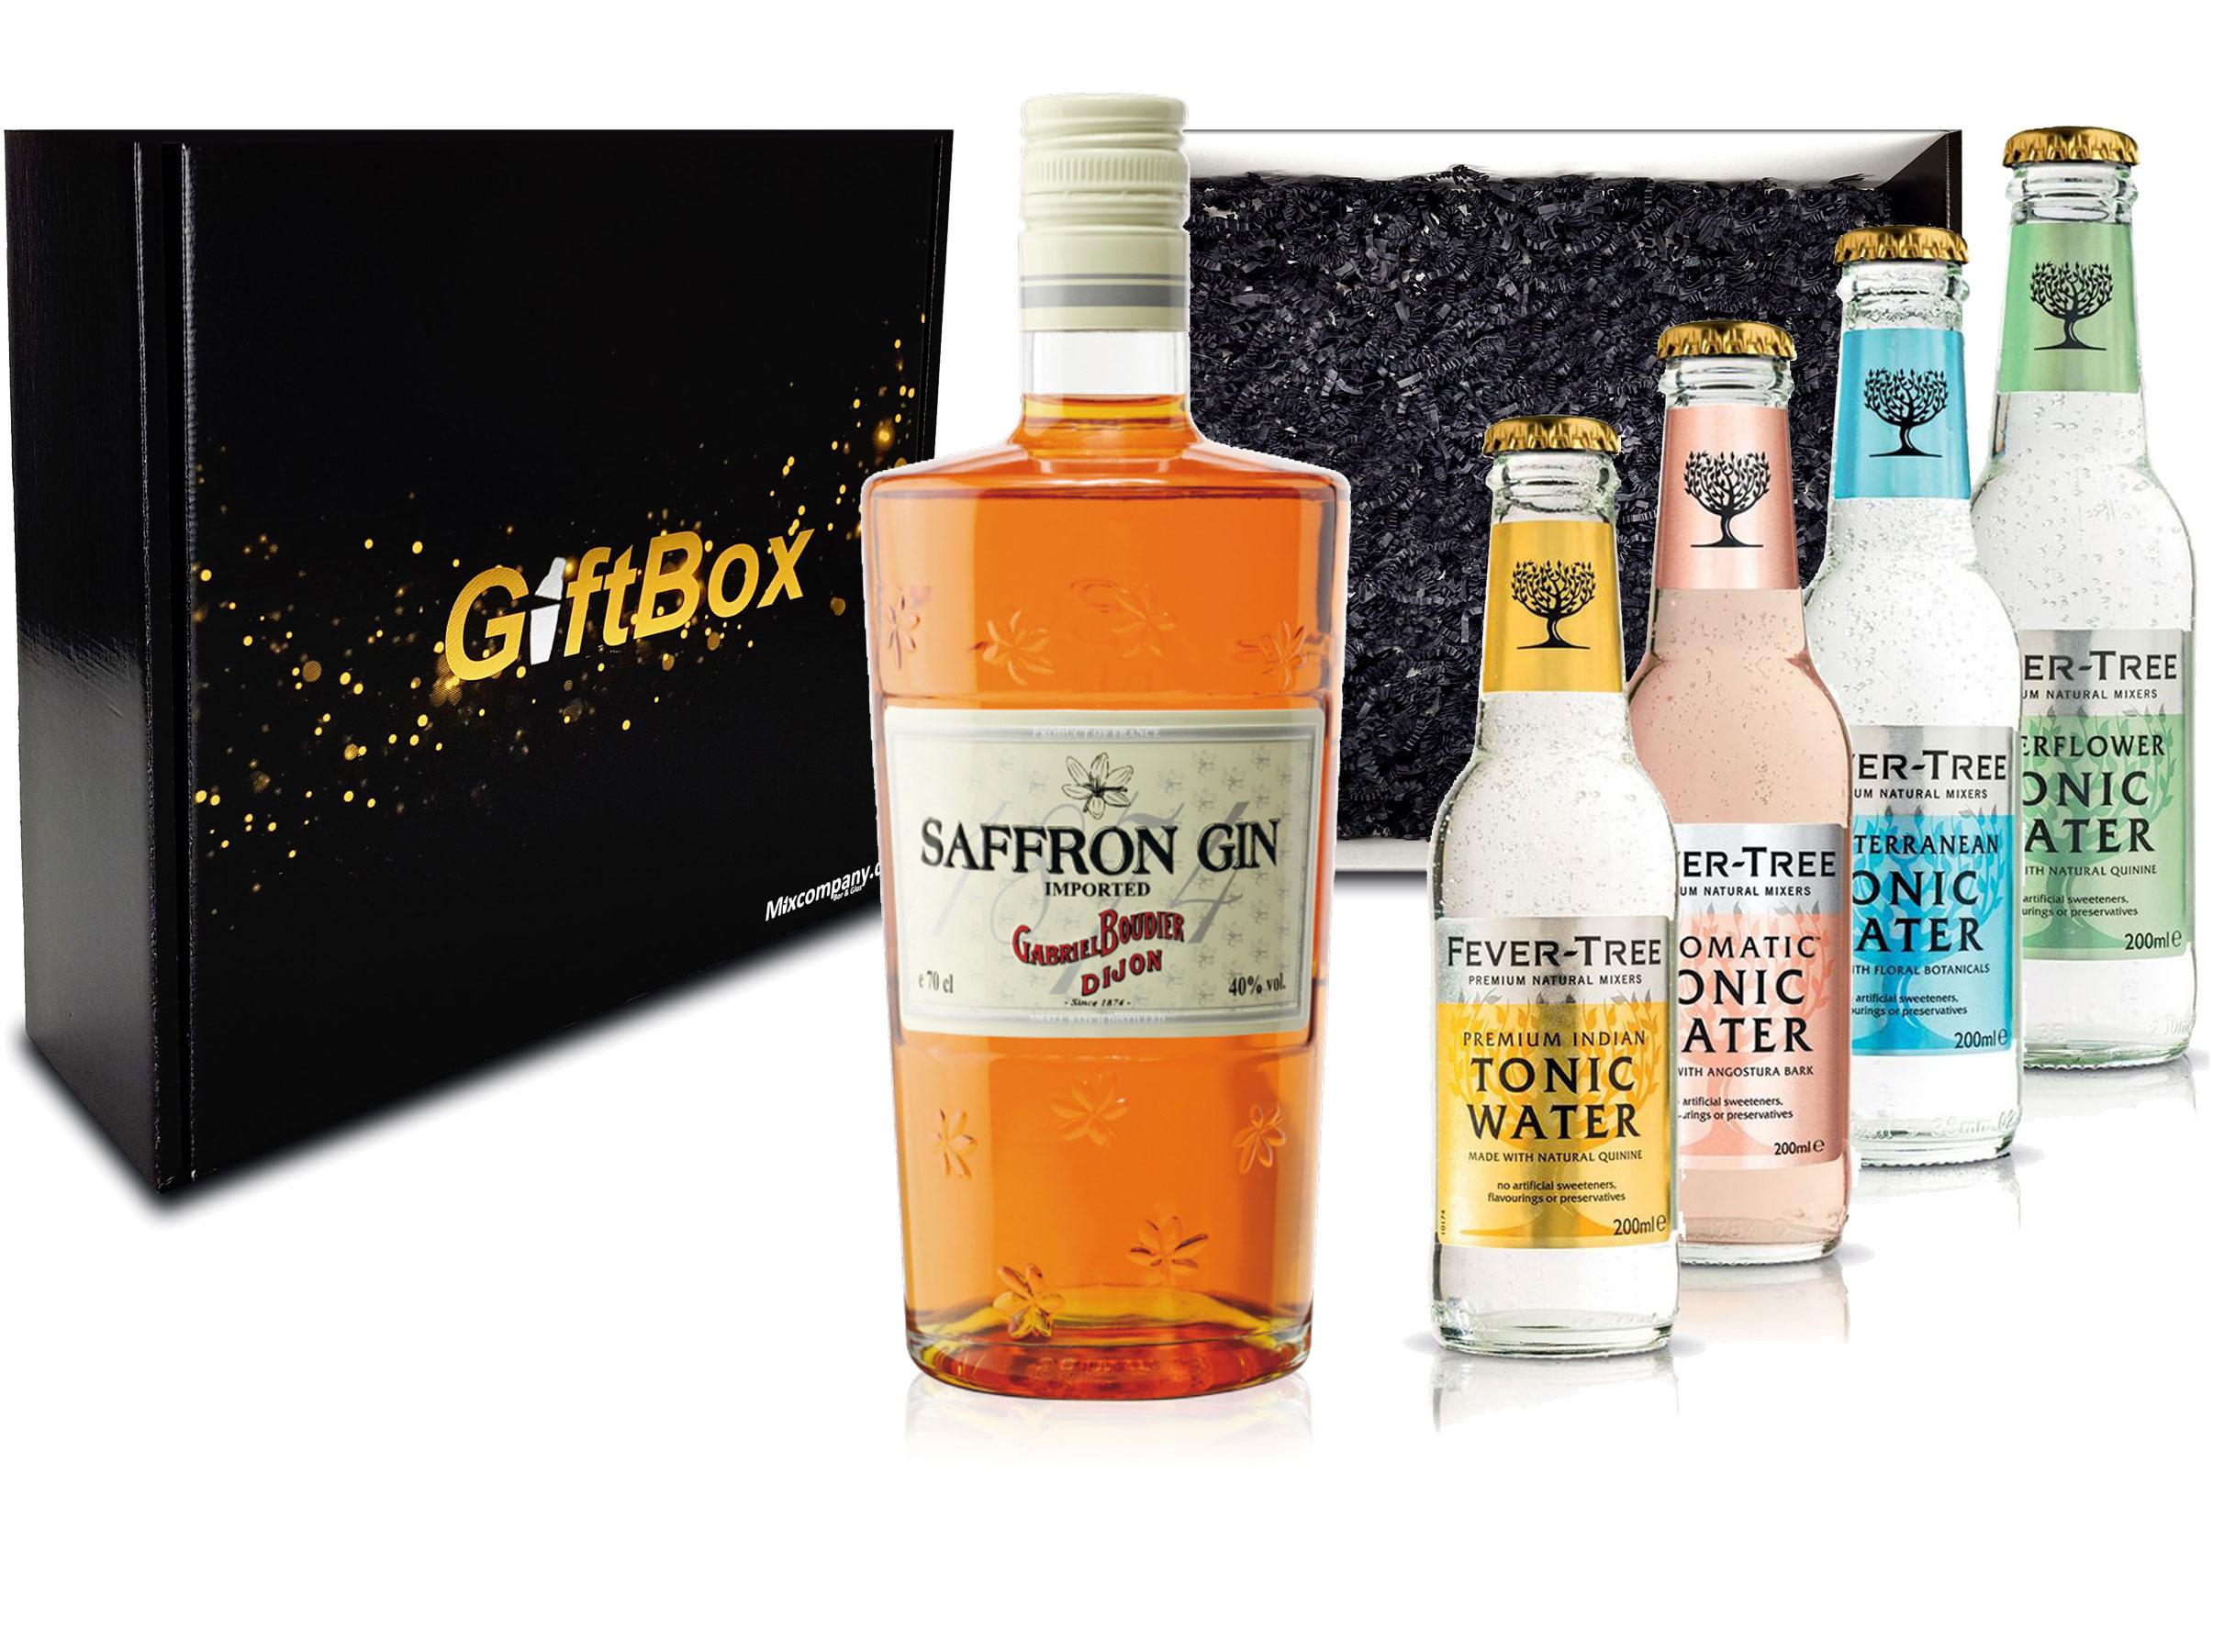 Gin Tonic Set Giftbox Geschenkset - Saffron Gin 0,7l 700ml (40% Vol) + 4x Fever Tree Tonic Water Mix je 200ml inkl. Pfand MEHRWEG -[Enthält Sulfite]